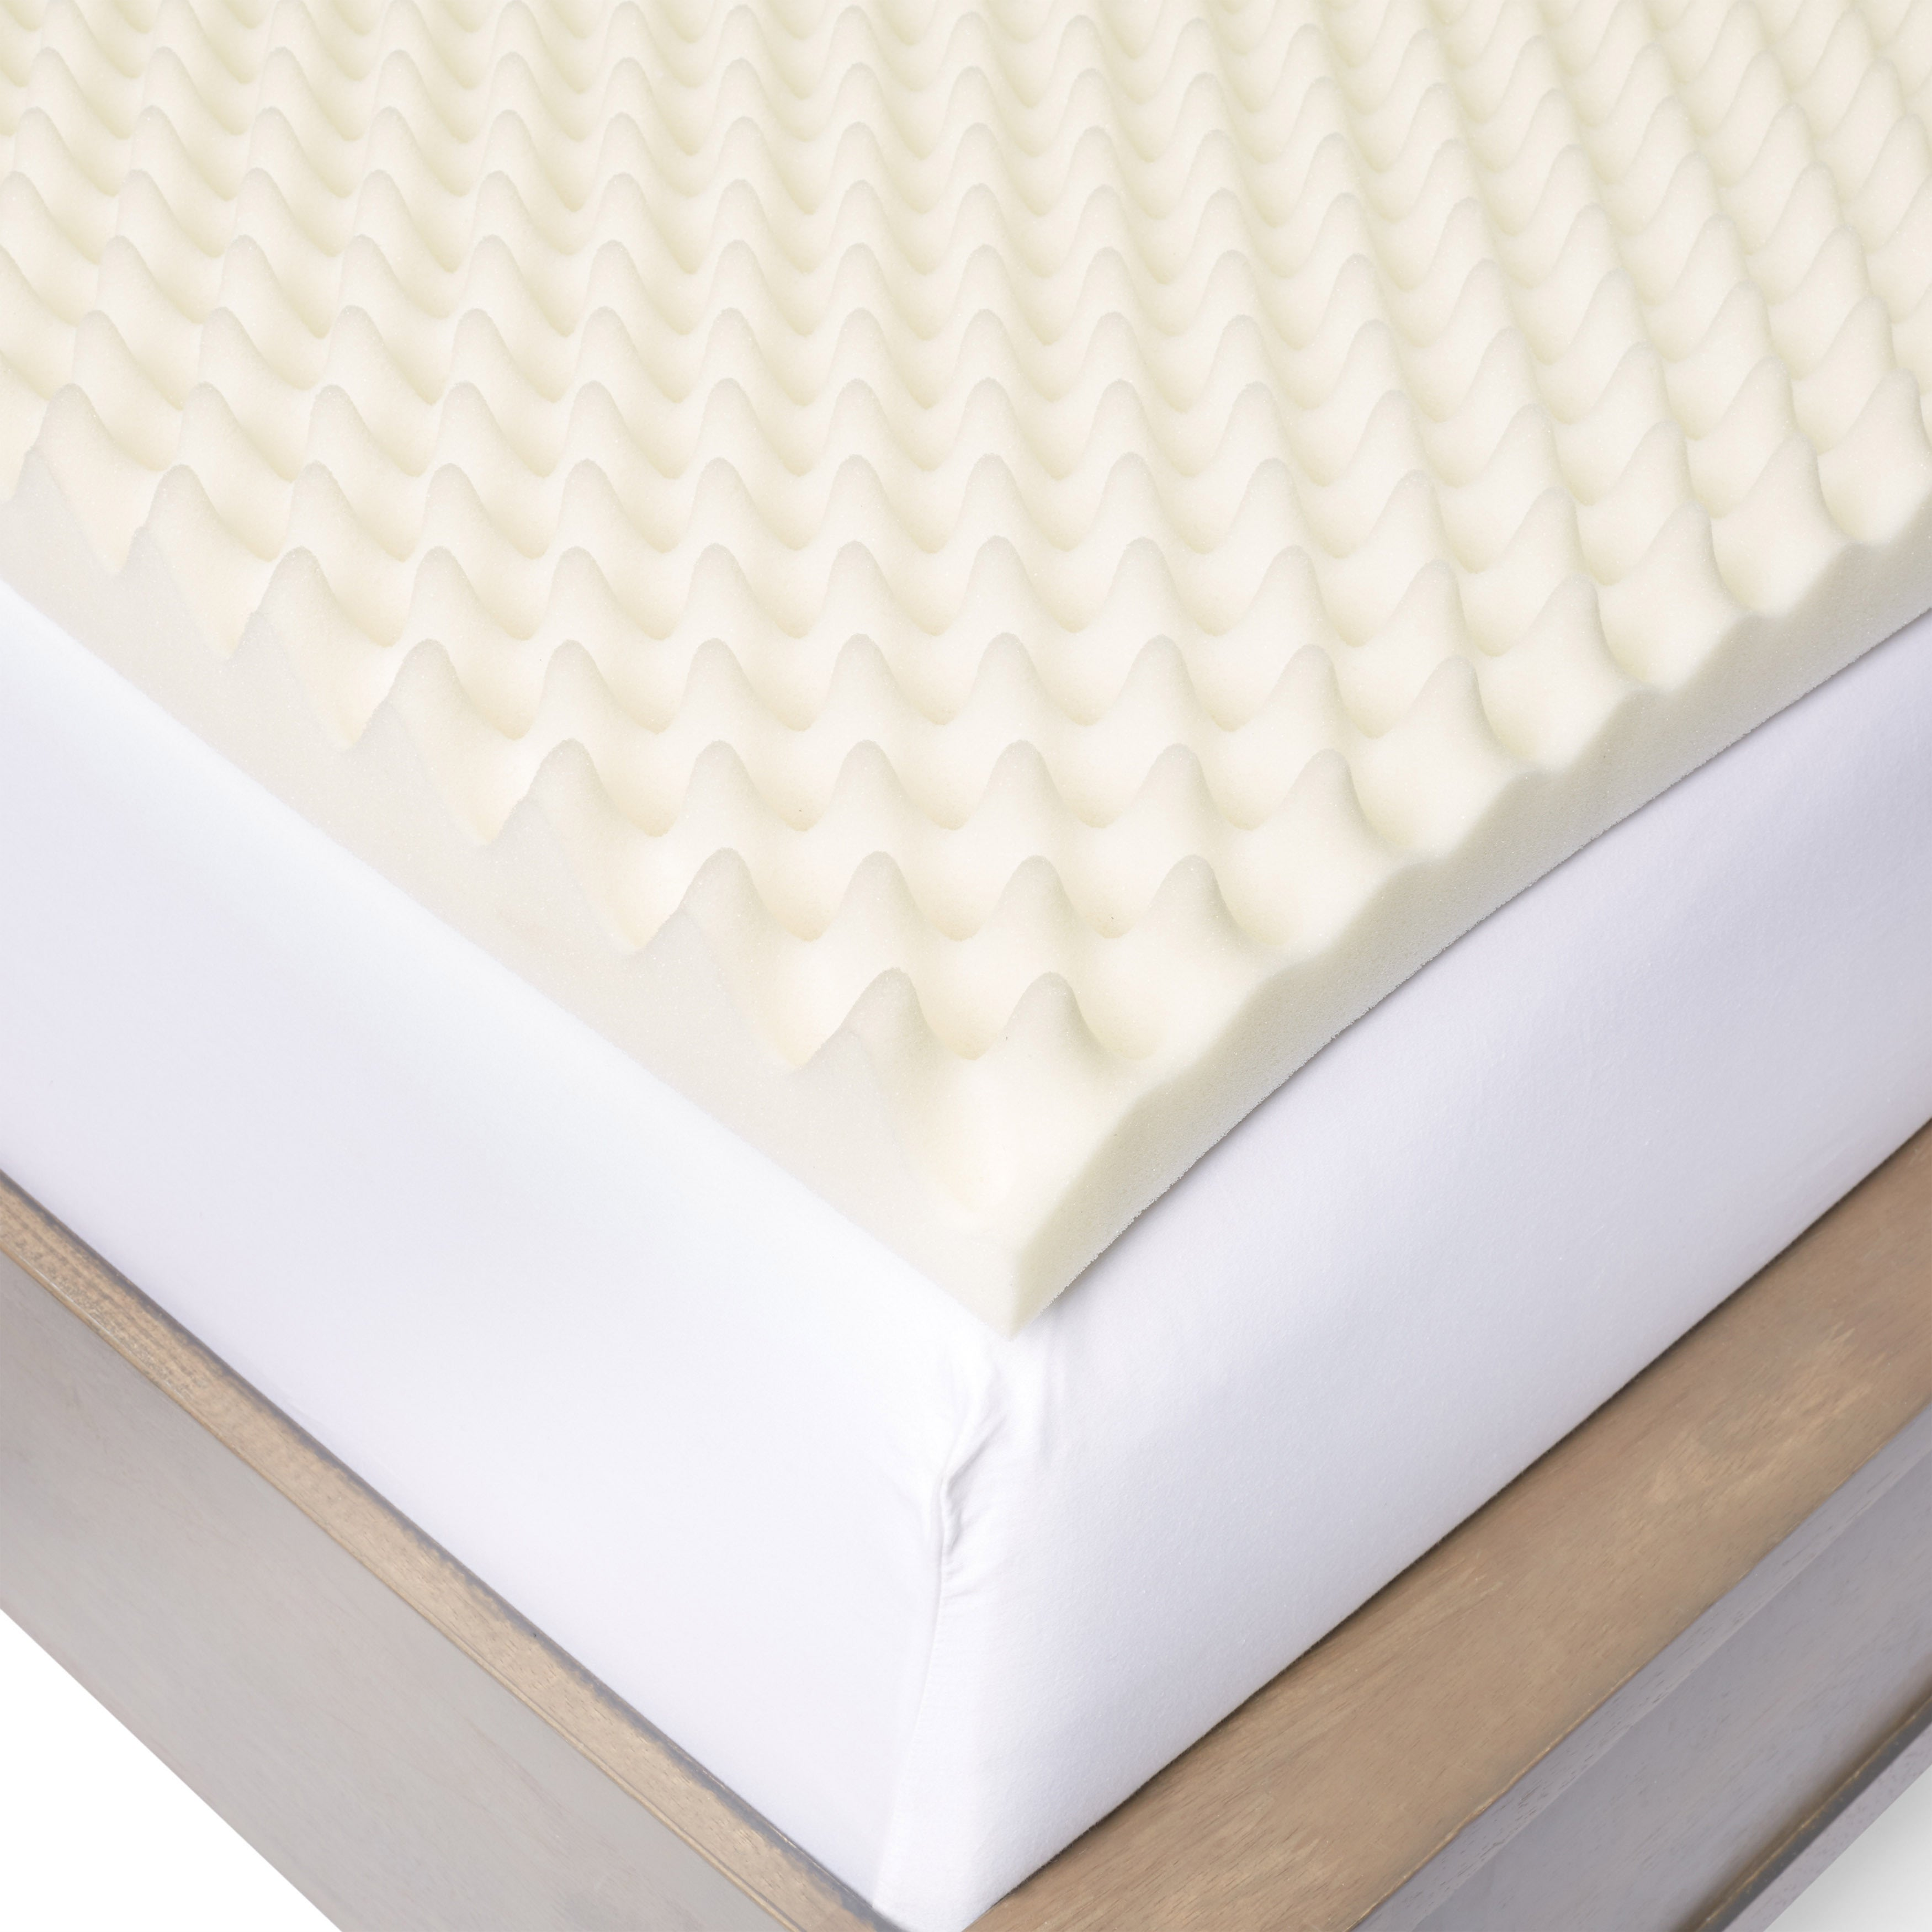 foam q cover cool w memory queen pad fabric bamboo gel topper mattress top